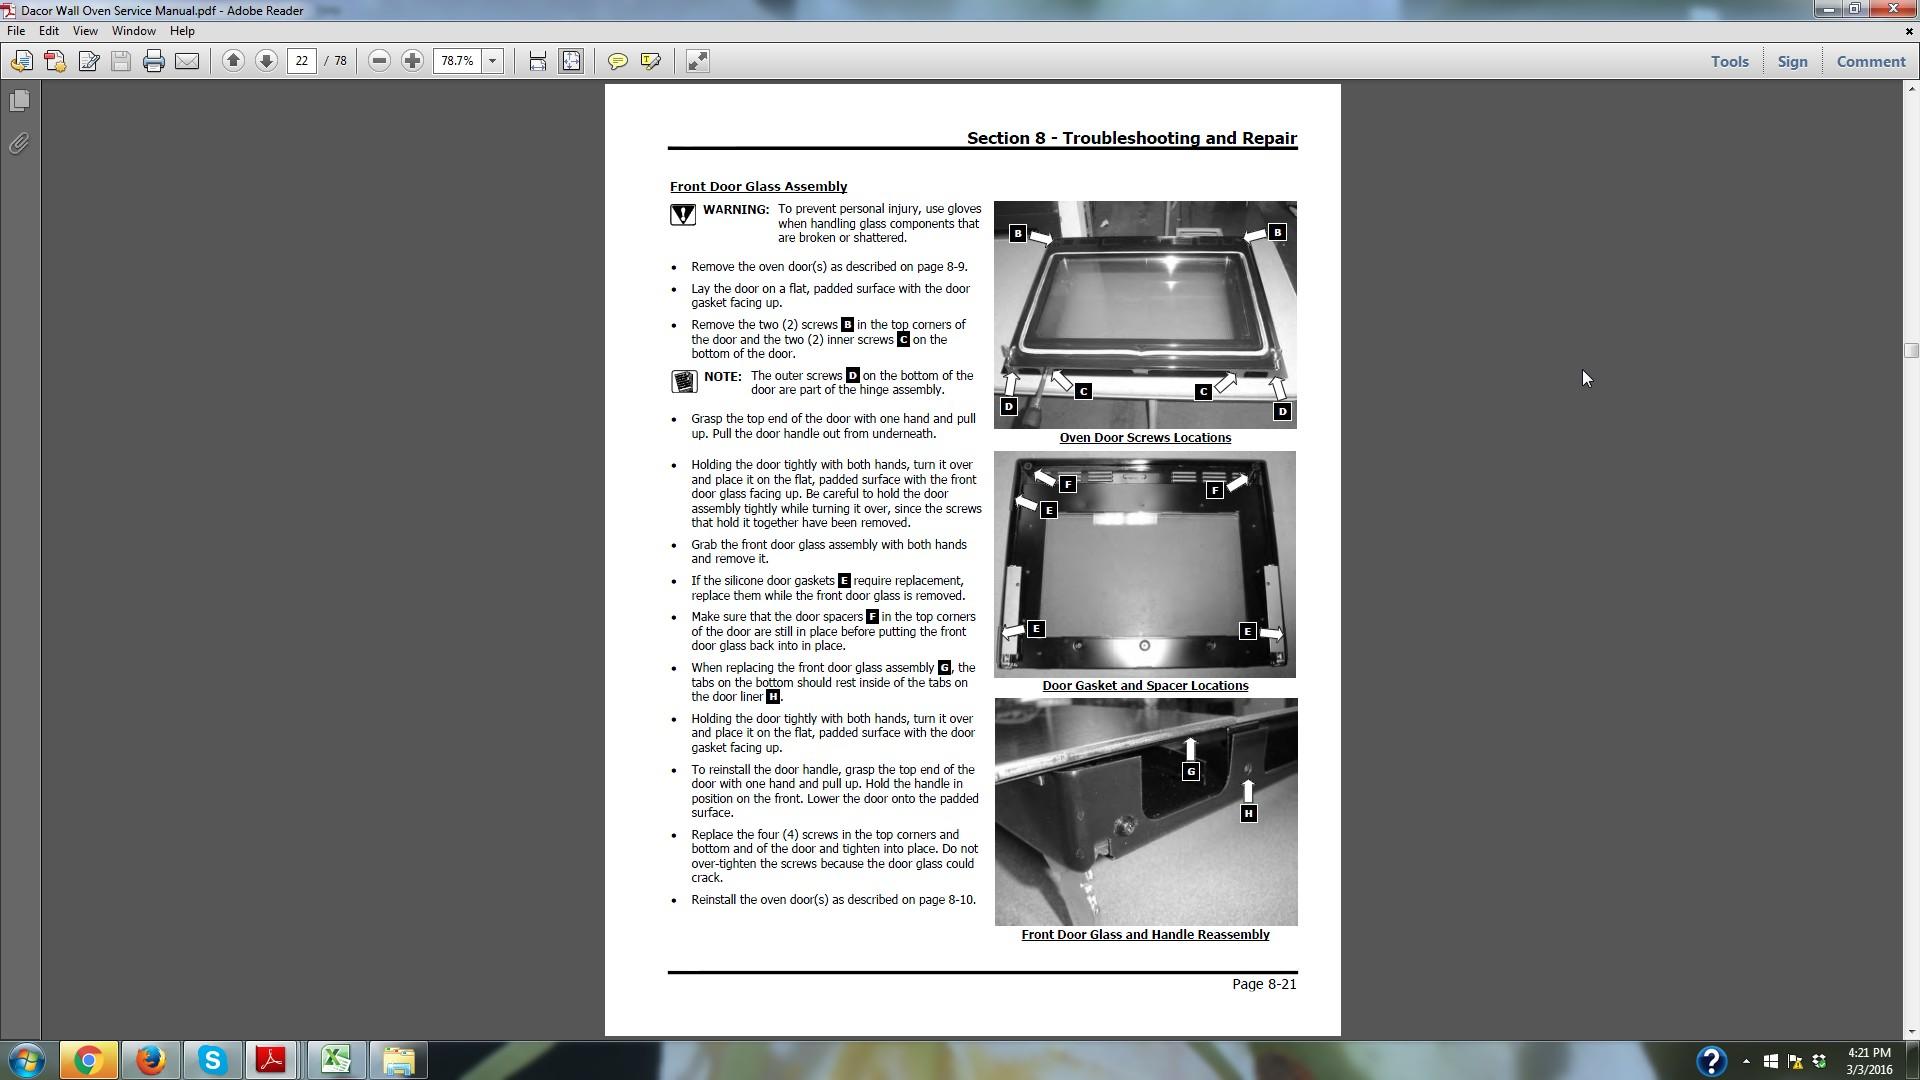 Dacor Ecs230sch Double Wall Oven Wiring Diagram For 45212476 F998 484c 9df2 48de0a7200a2 Screenhunter 1909 Mar 03 1621